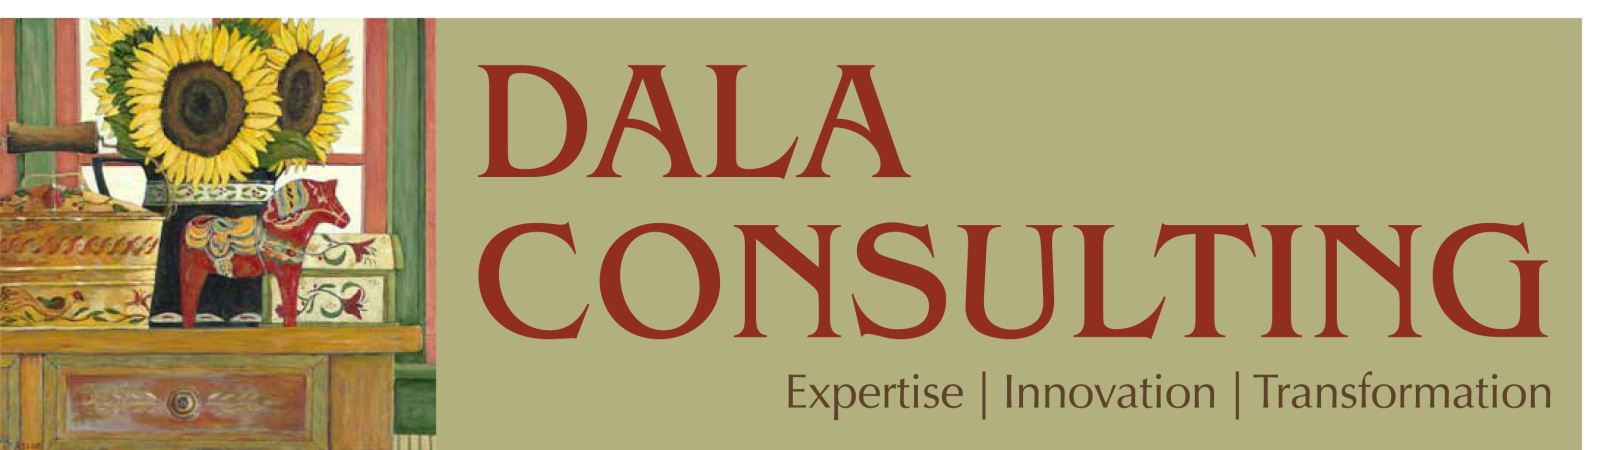 Dala Consulting